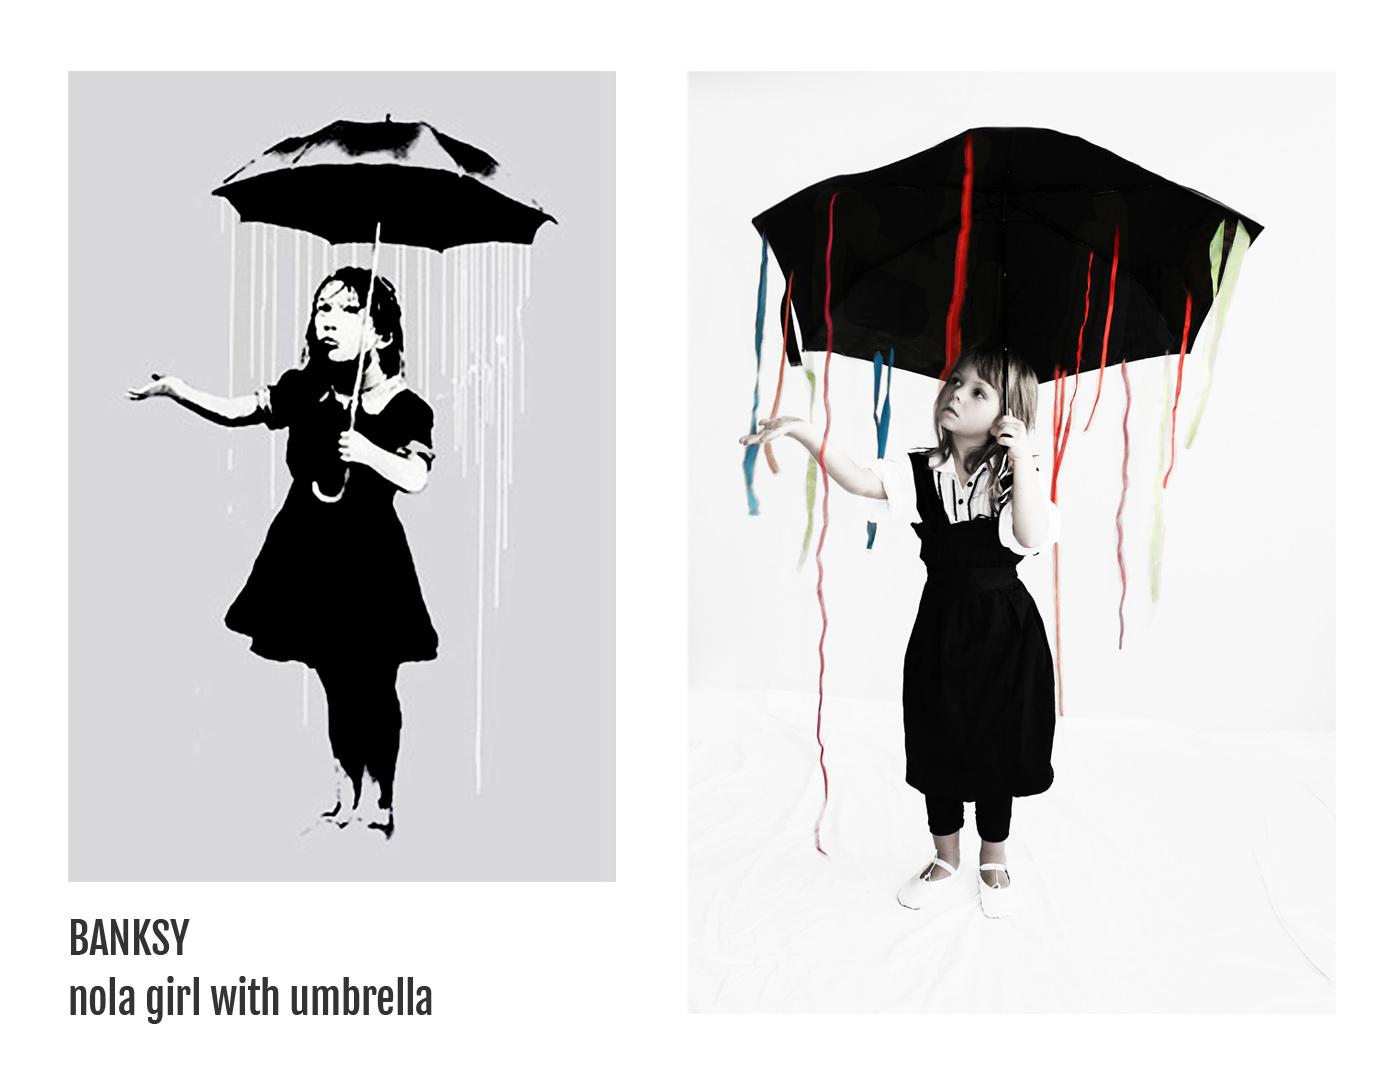 Banksy - Nola girl with umbrella